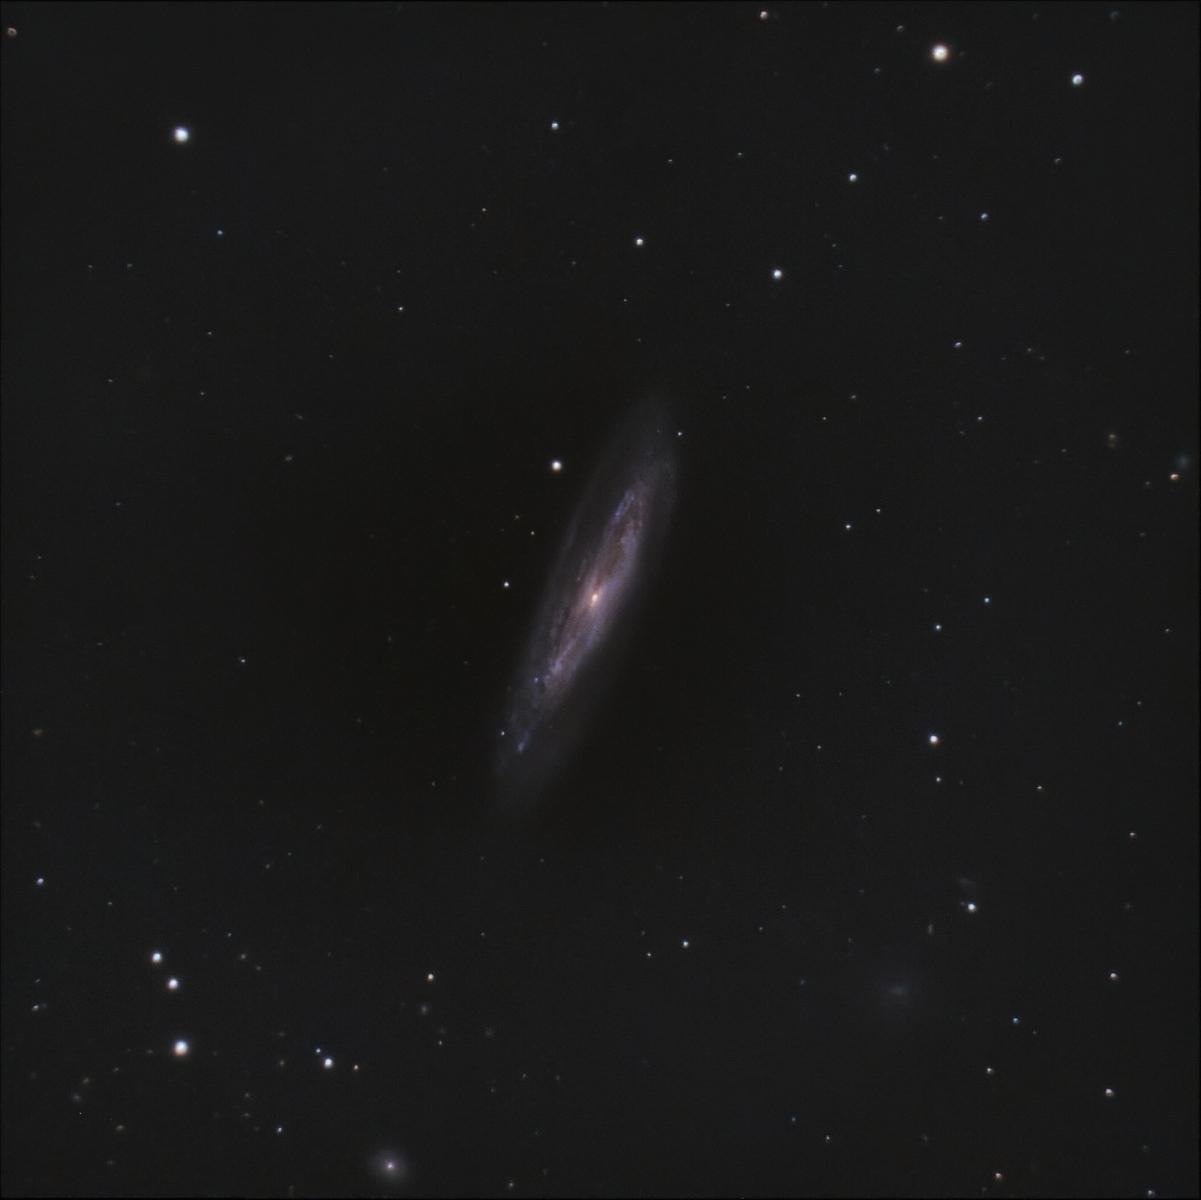 NGC_4192_-_M98.jpg